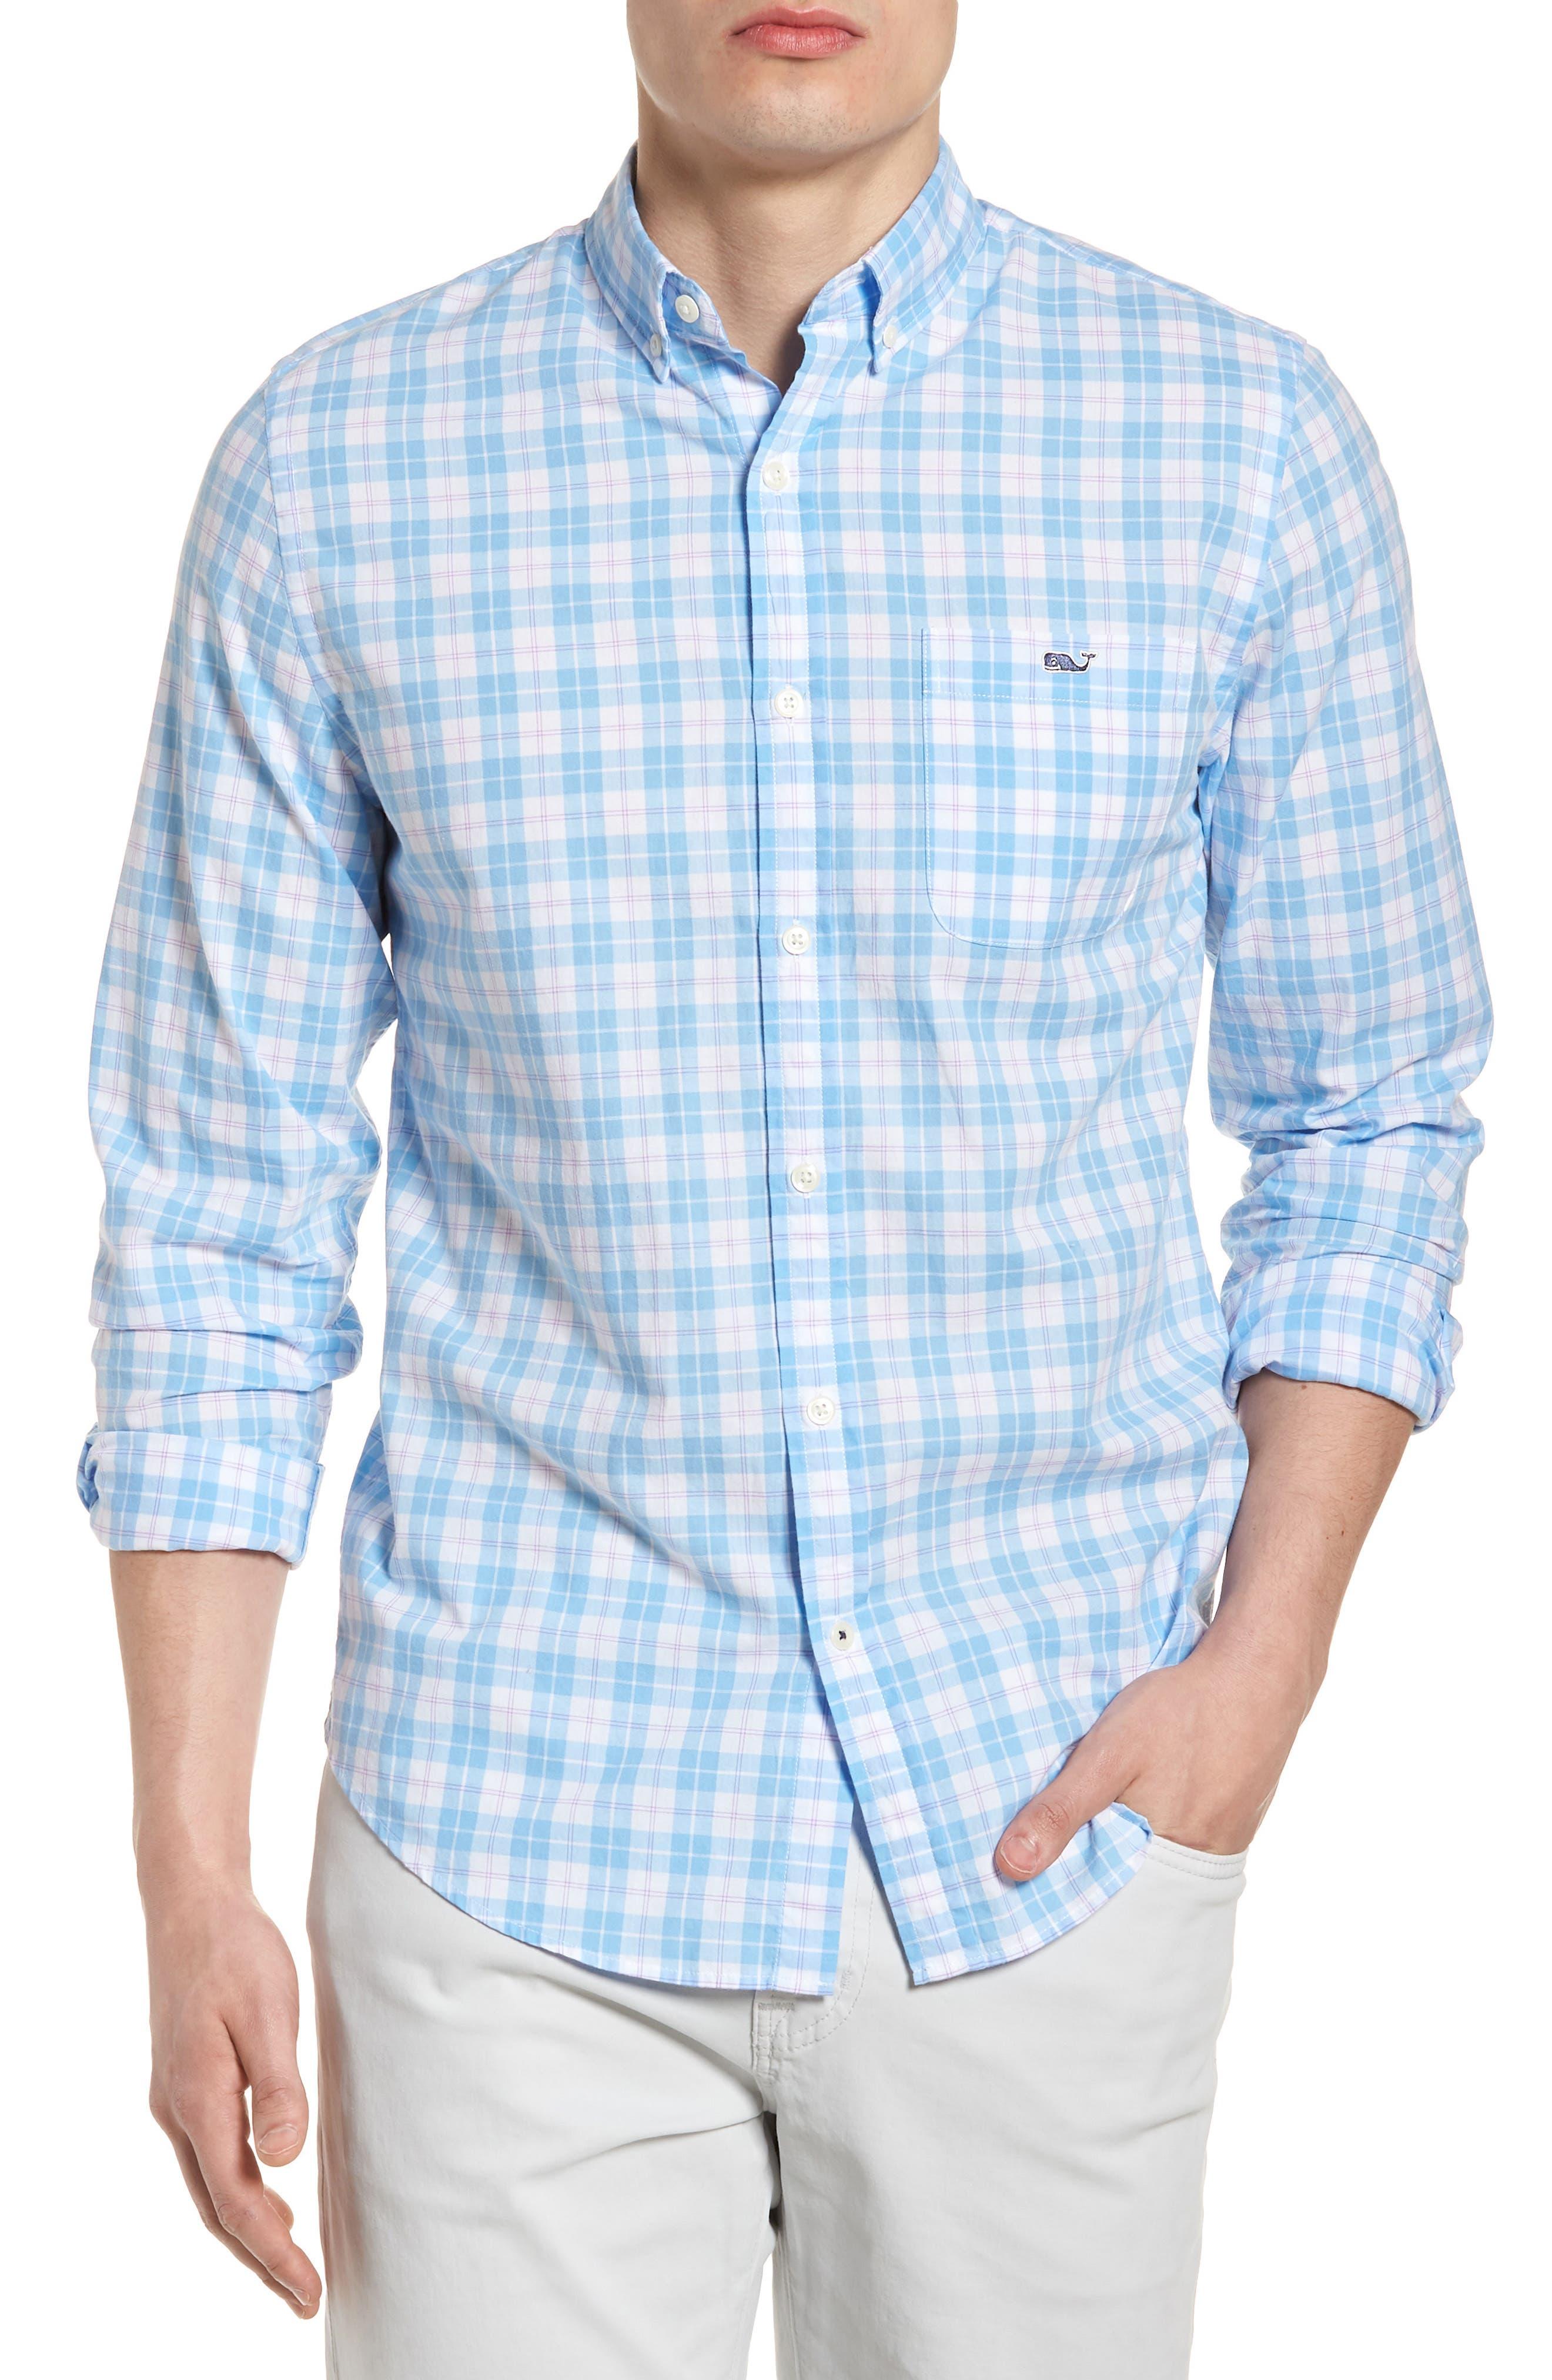 Shallow Sea Slim Fit Plaid Sport Shirt,                             Main thumbnail 1, color,                             Ocean Breeze